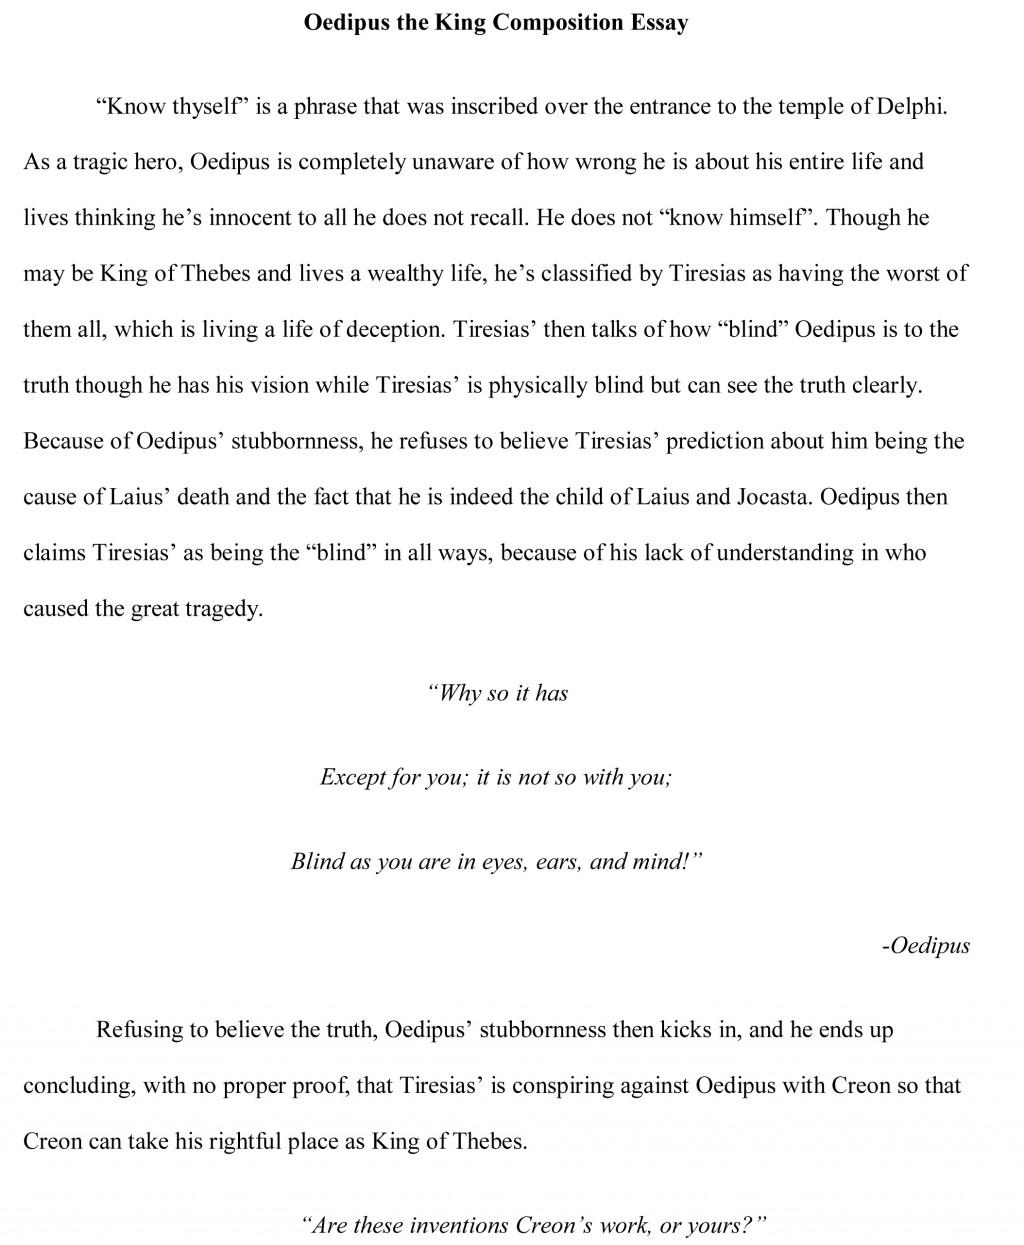 019 Macbeth Tragic Hero Essay Oedipus Free Sample Stunning Introduction Conclusion Pdf Large